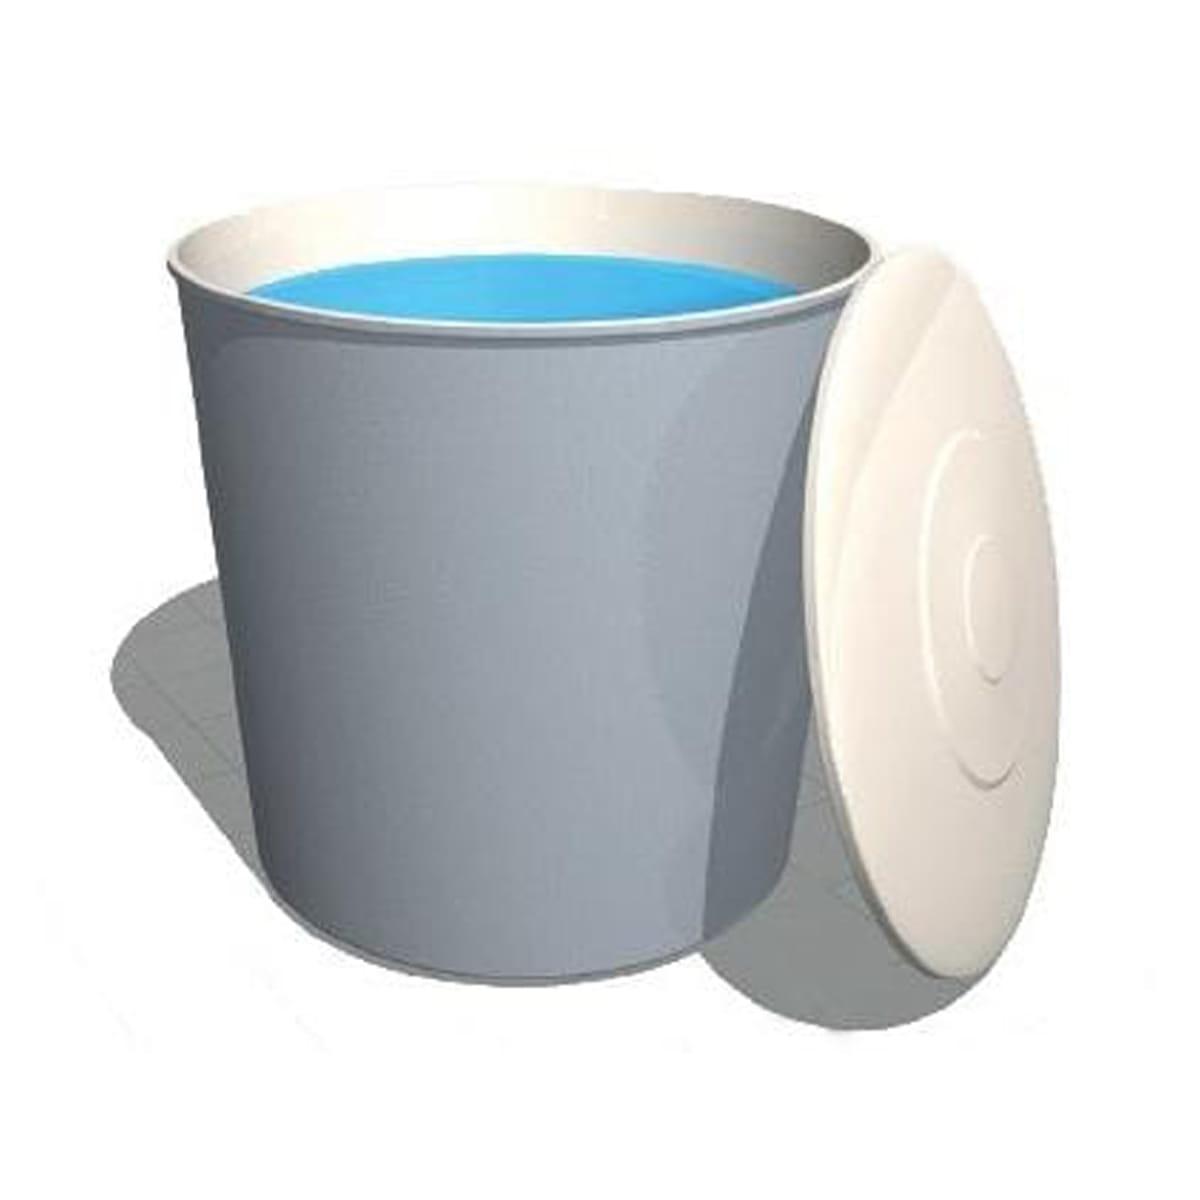 Deposito con tapa abierta de poliester cilindrico